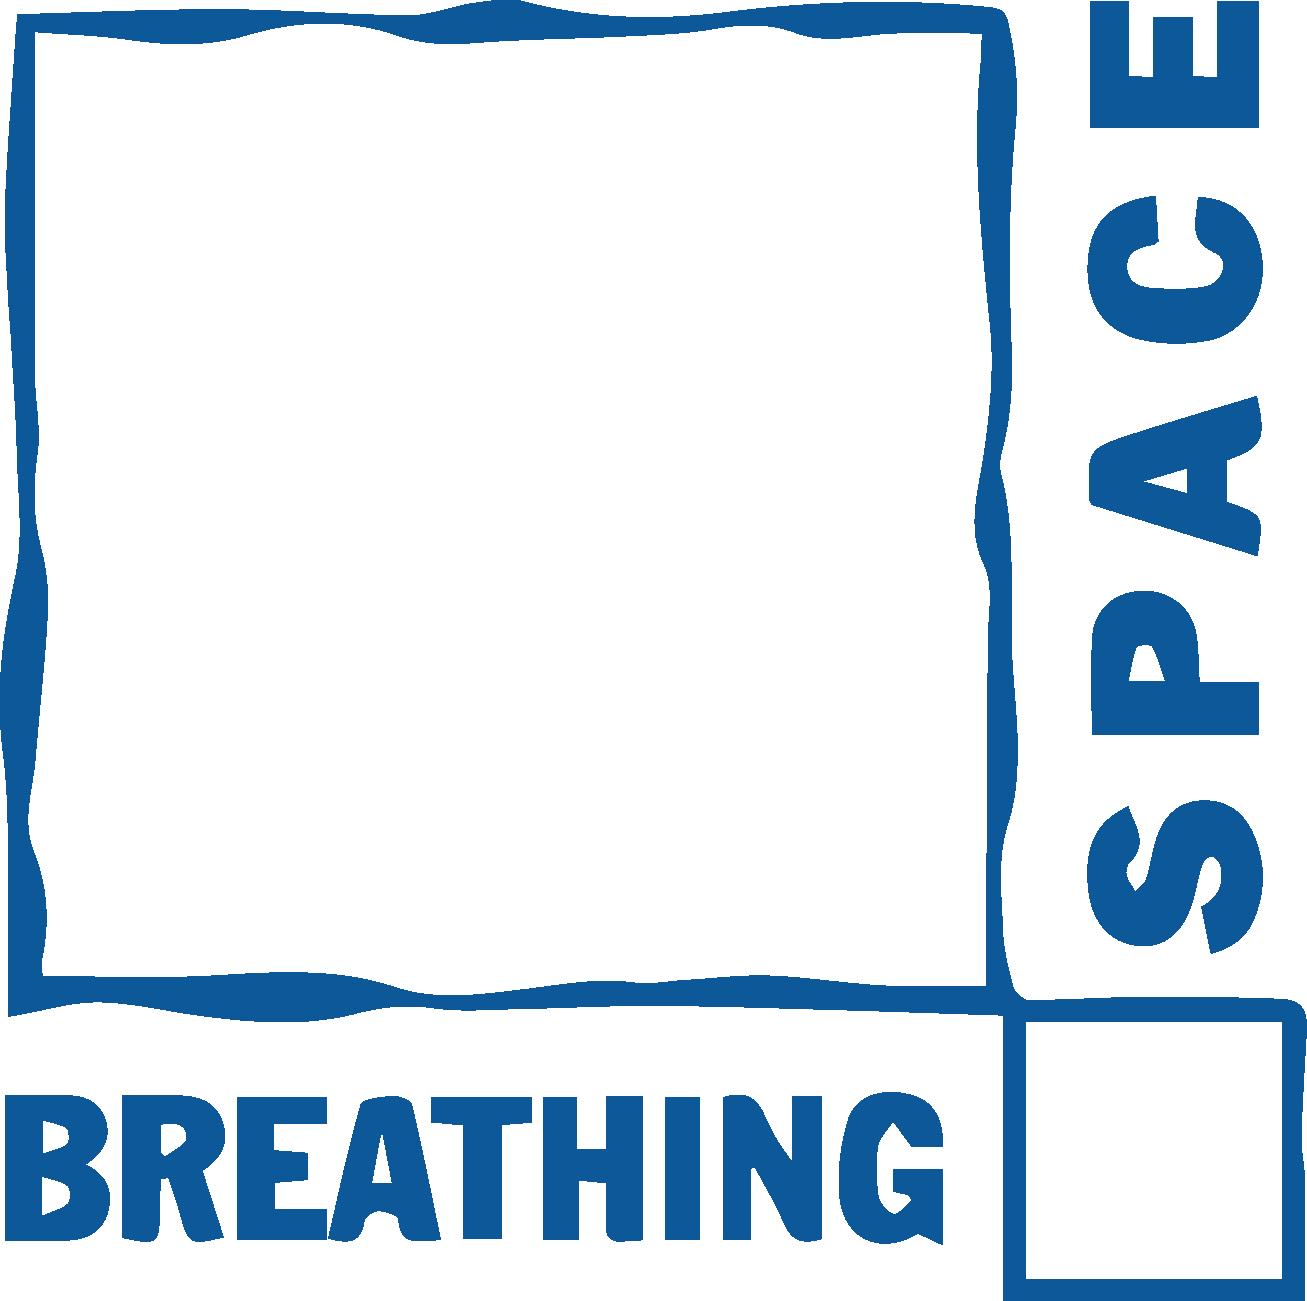 Breathing Space logo